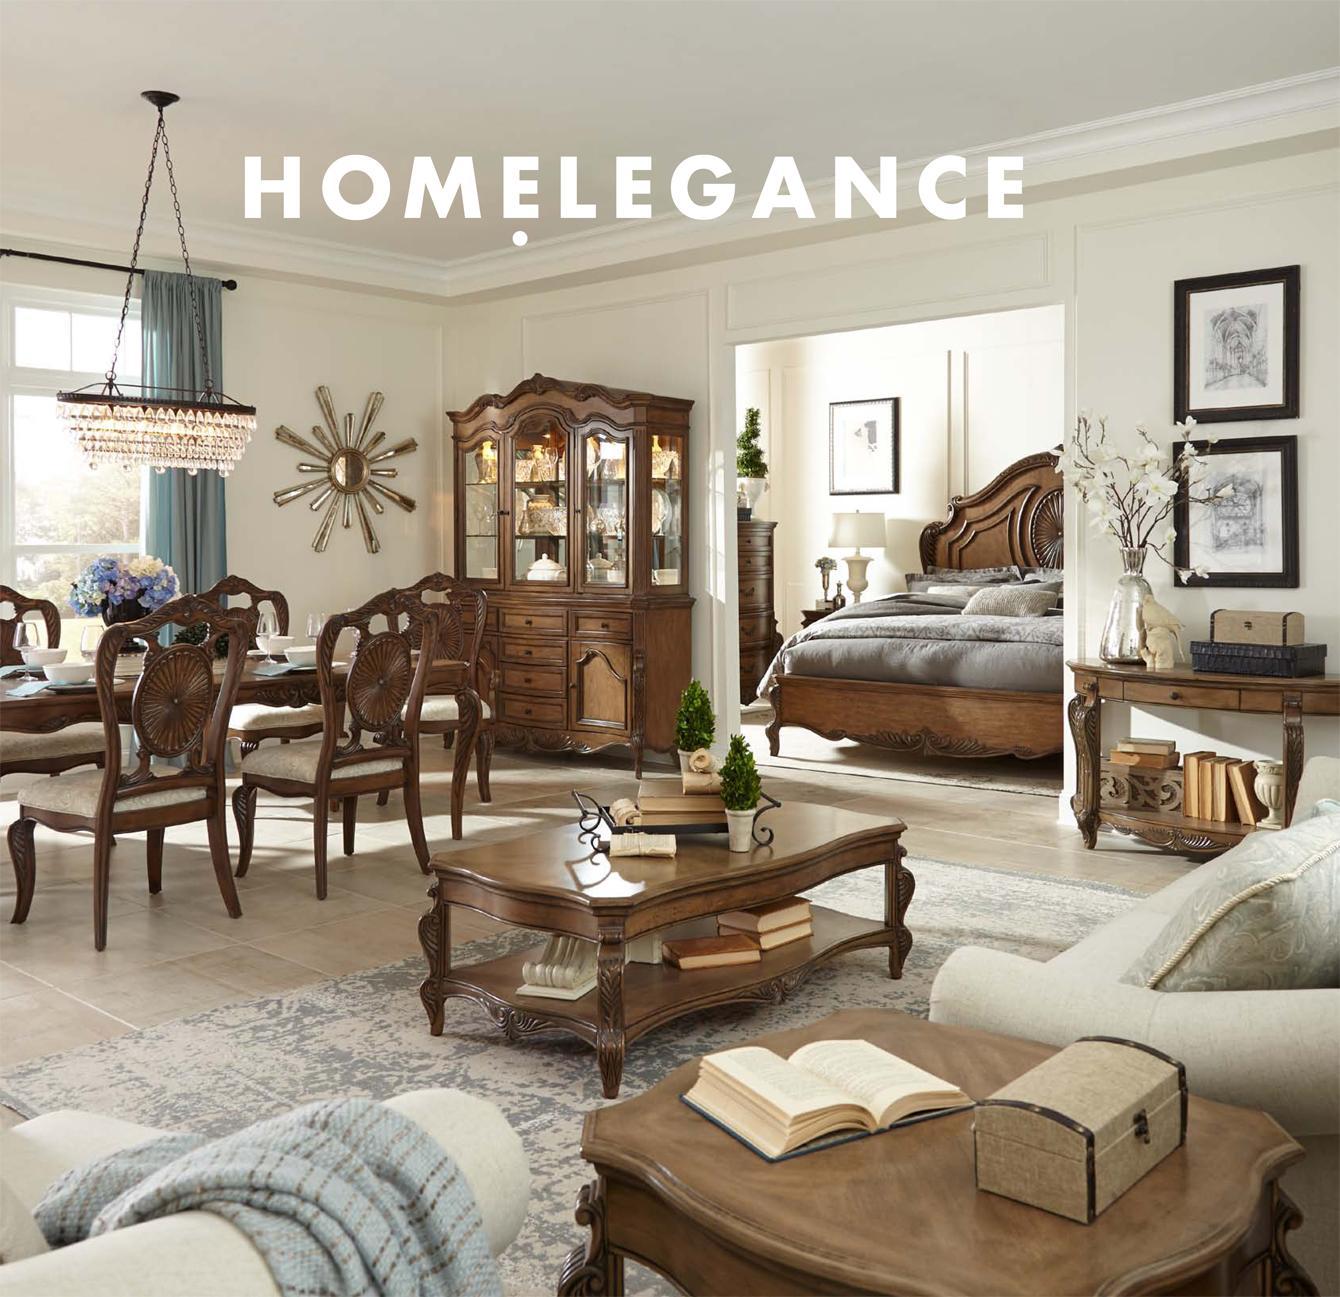 Amazon Com Homelegance Avalon Leather Dining Room Chair